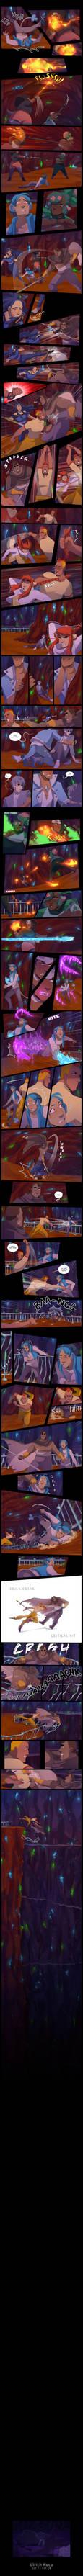 Burn Away - Page 27